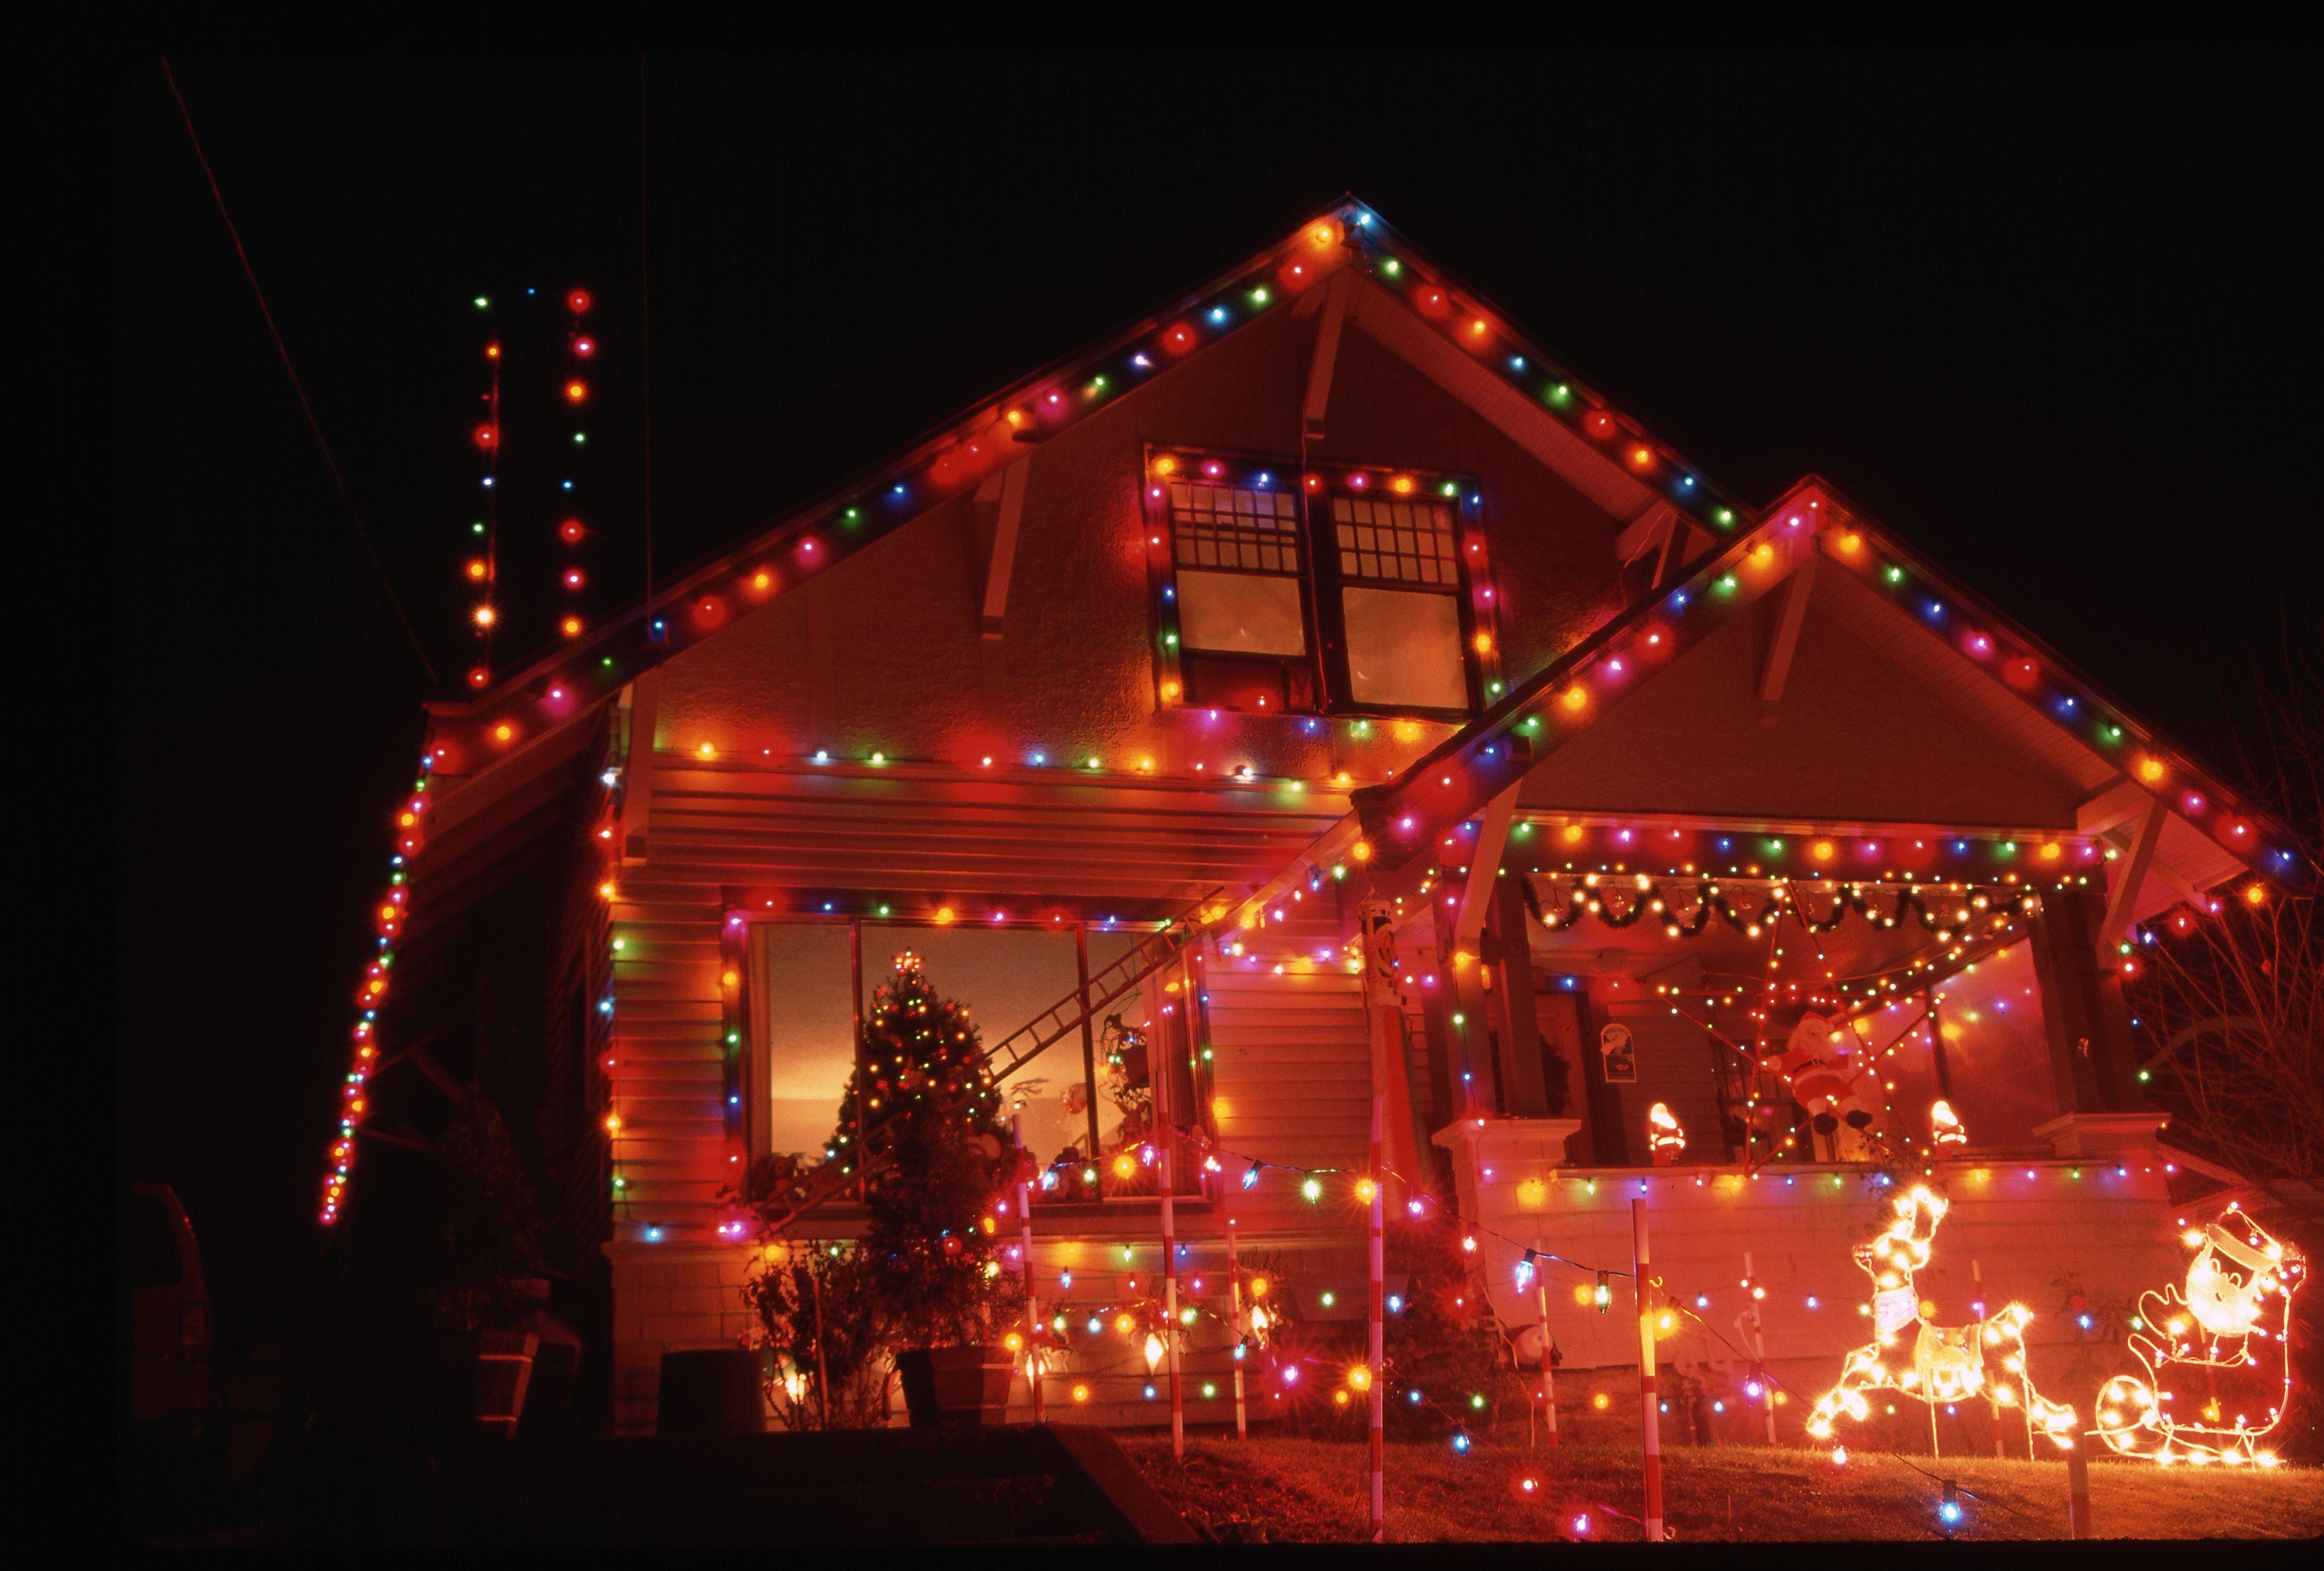 Hogle Zoo Christmas Lights